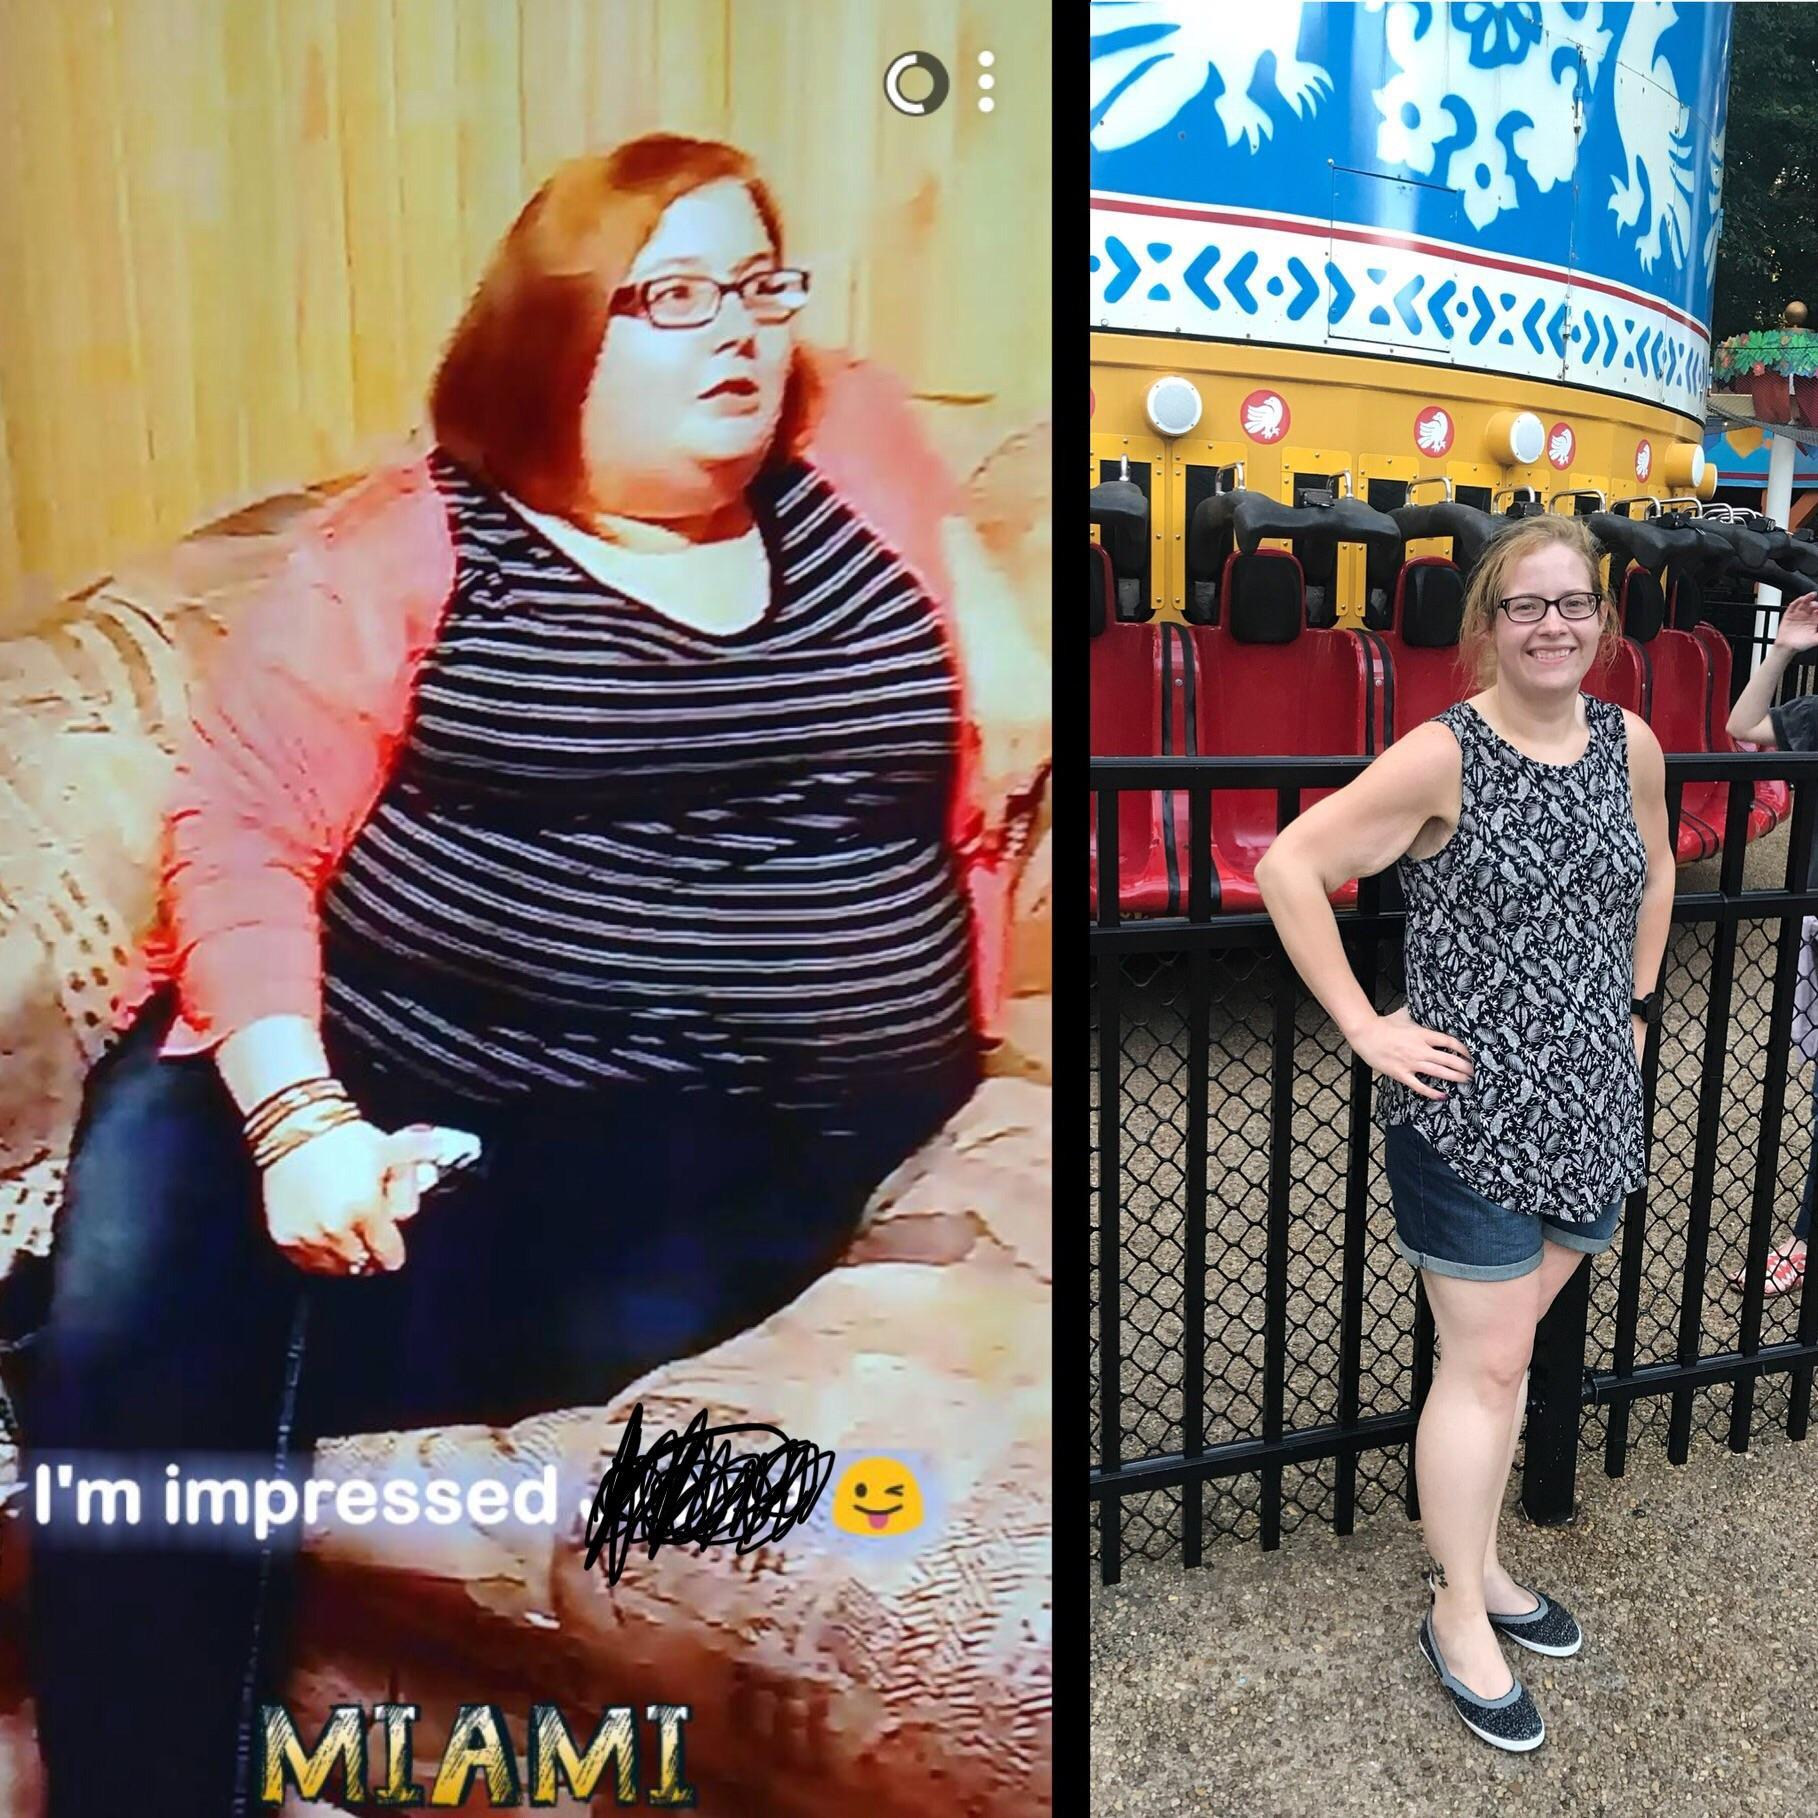 5 feet 3 Female Progress Pics of 172 lbs Weight Loss 322 lbs to 150 lbs